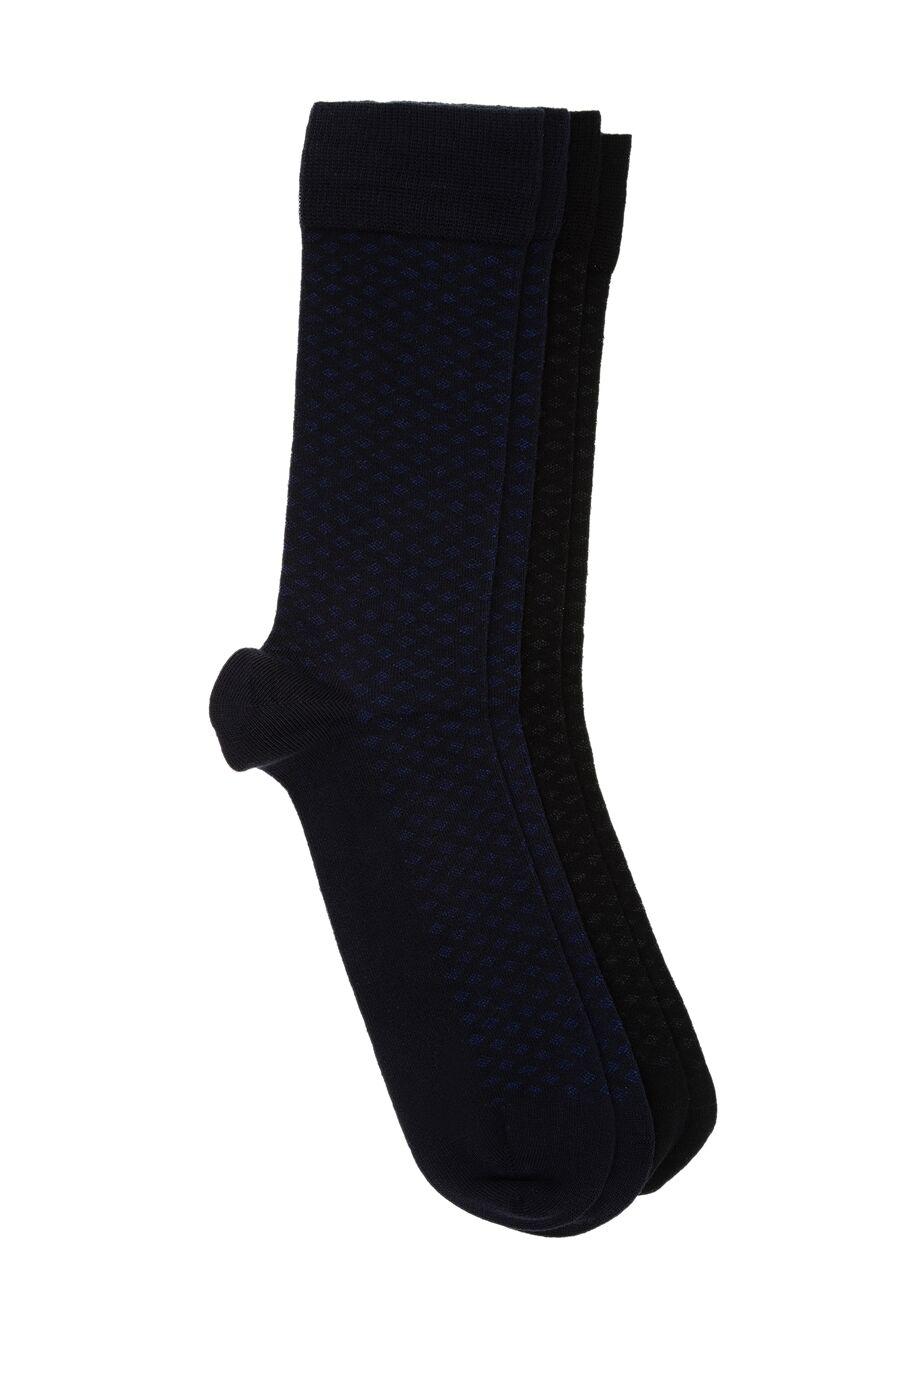 Bamboo Desenli Siyah 2'li Çorap Set